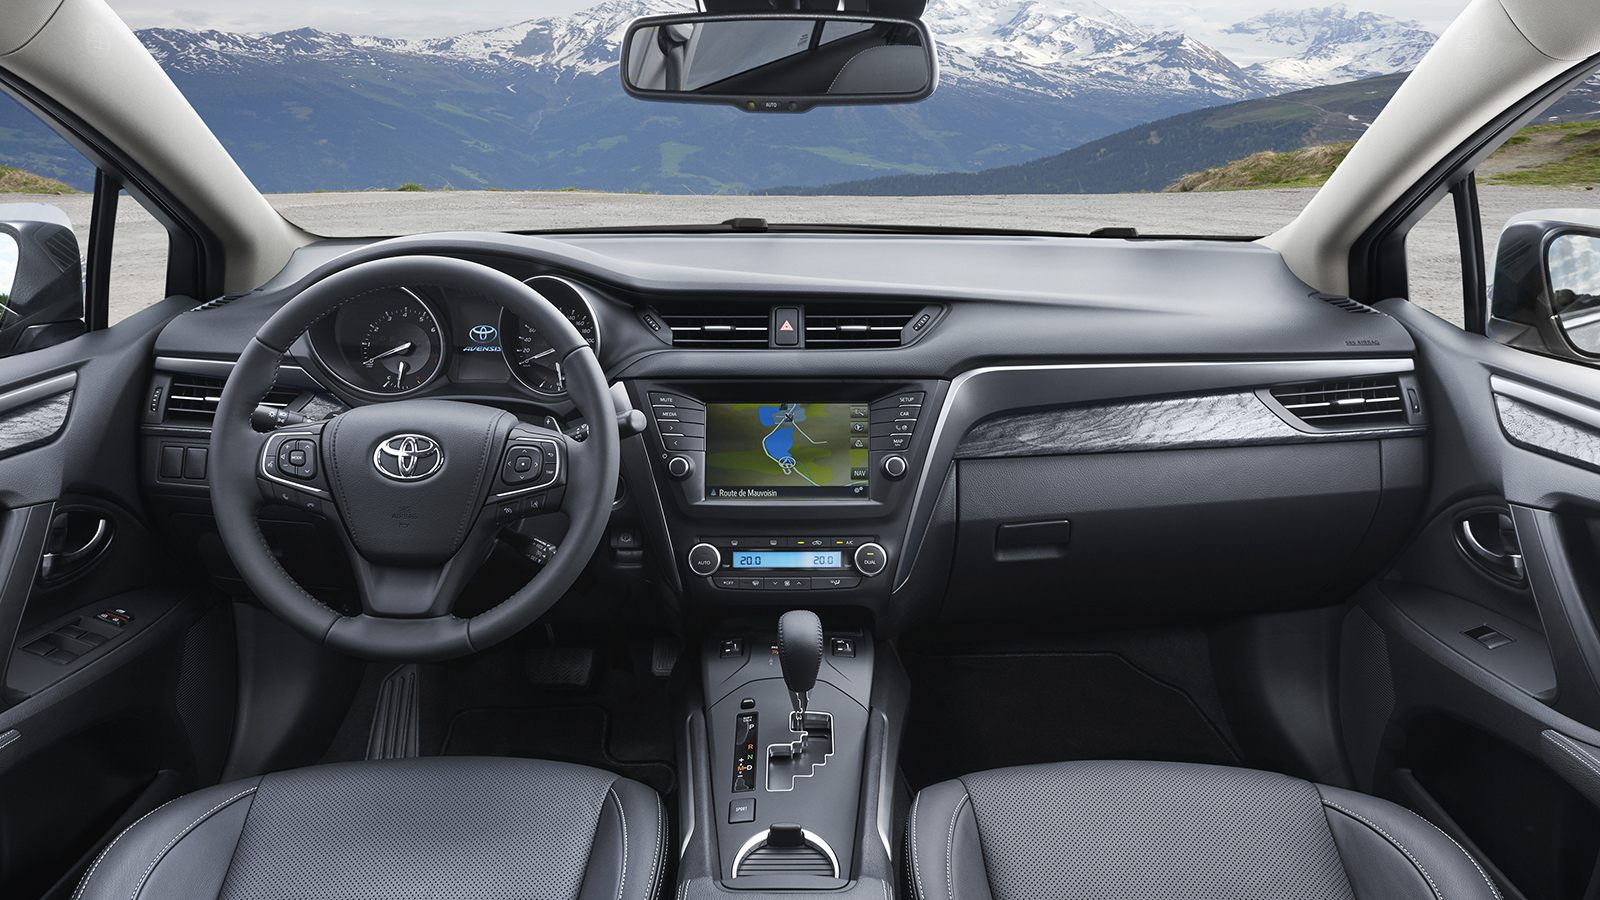 Toyota Avensis фото интерьера